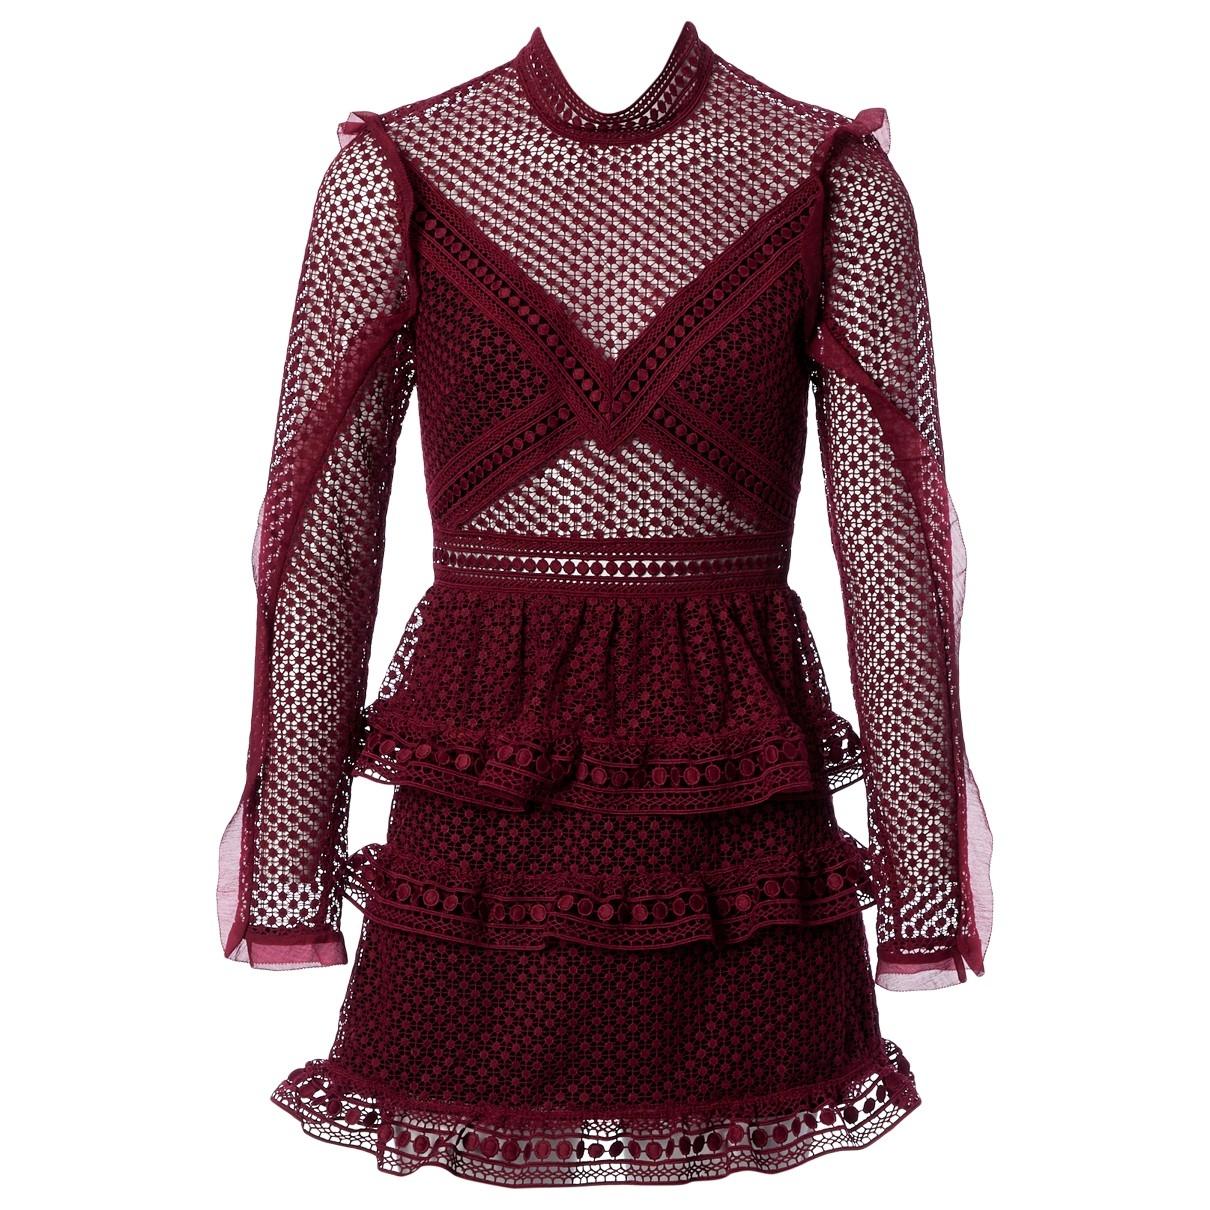 Self Portrait \N Burgundy dress for Women S International